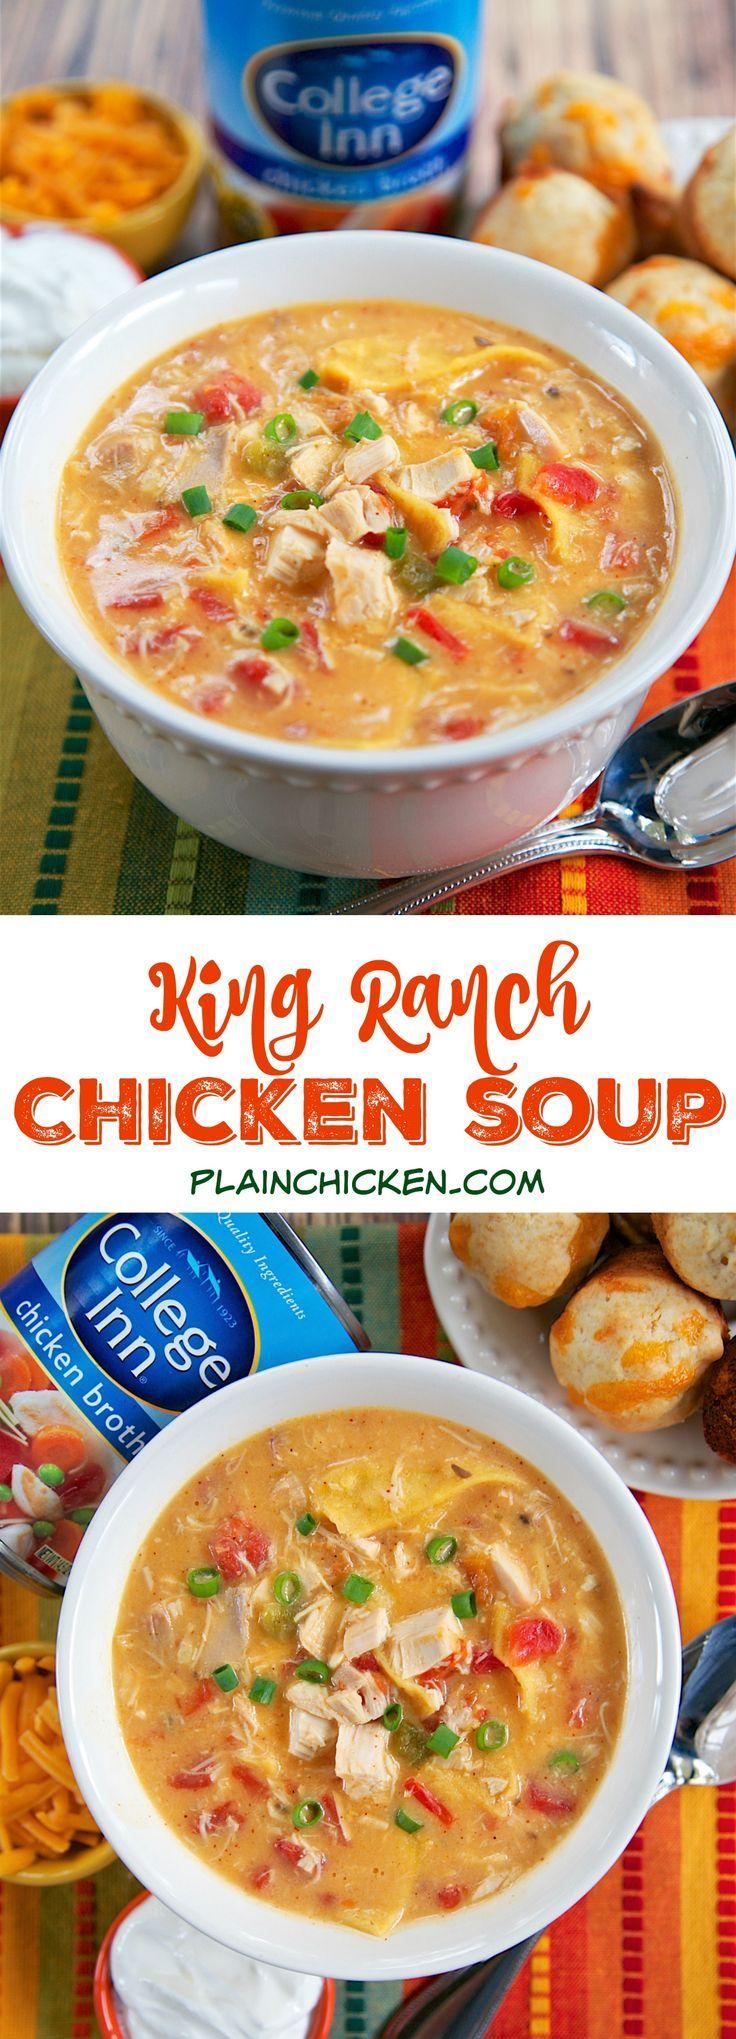 King Ranch Chicken Soup - Plain Chicken